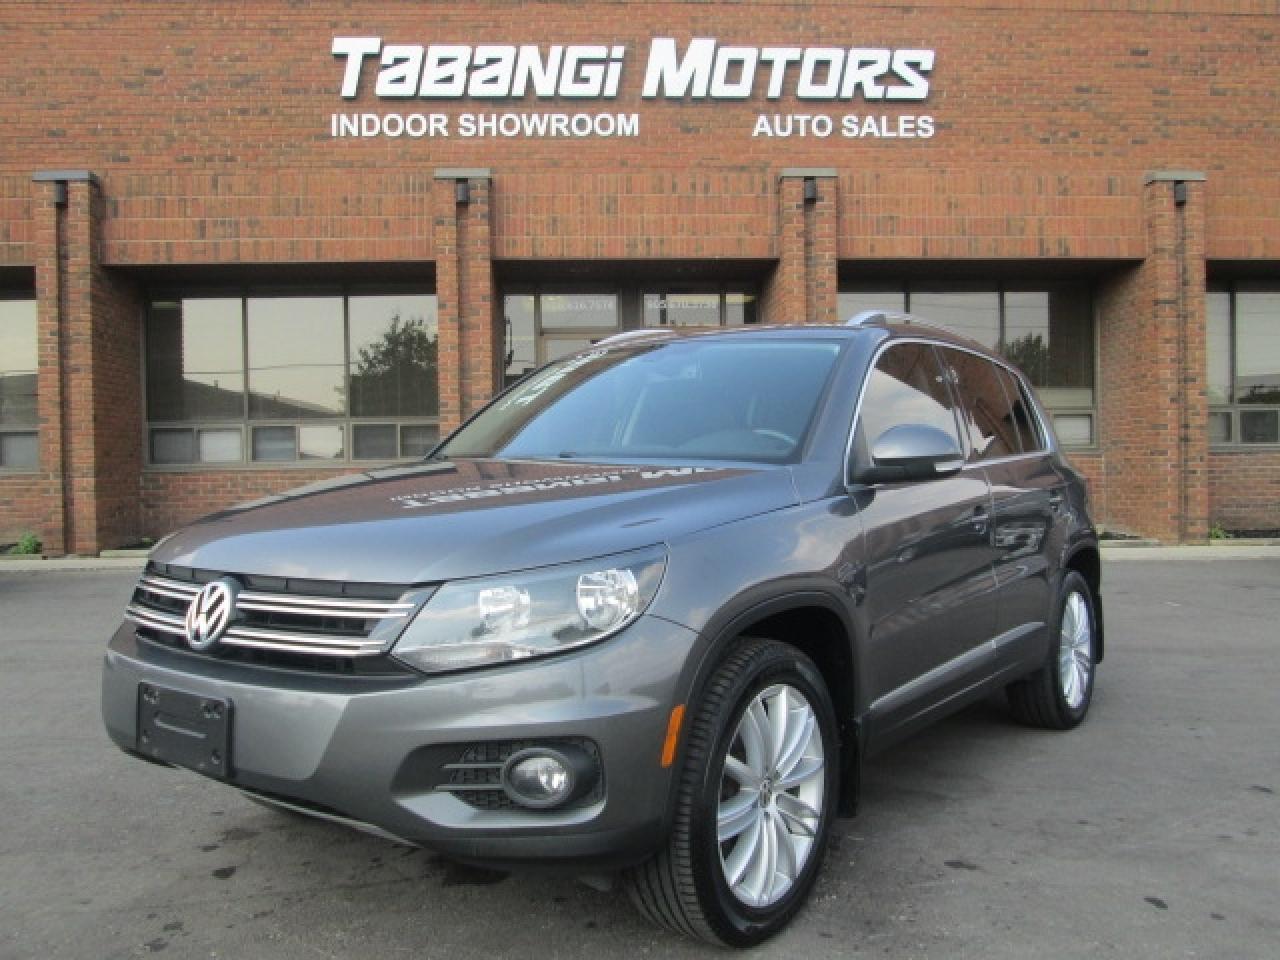 2012 Volkswagen Tiguan NAVIGATION | AWD | PANORAMIC ROOF | HIGHLINE |